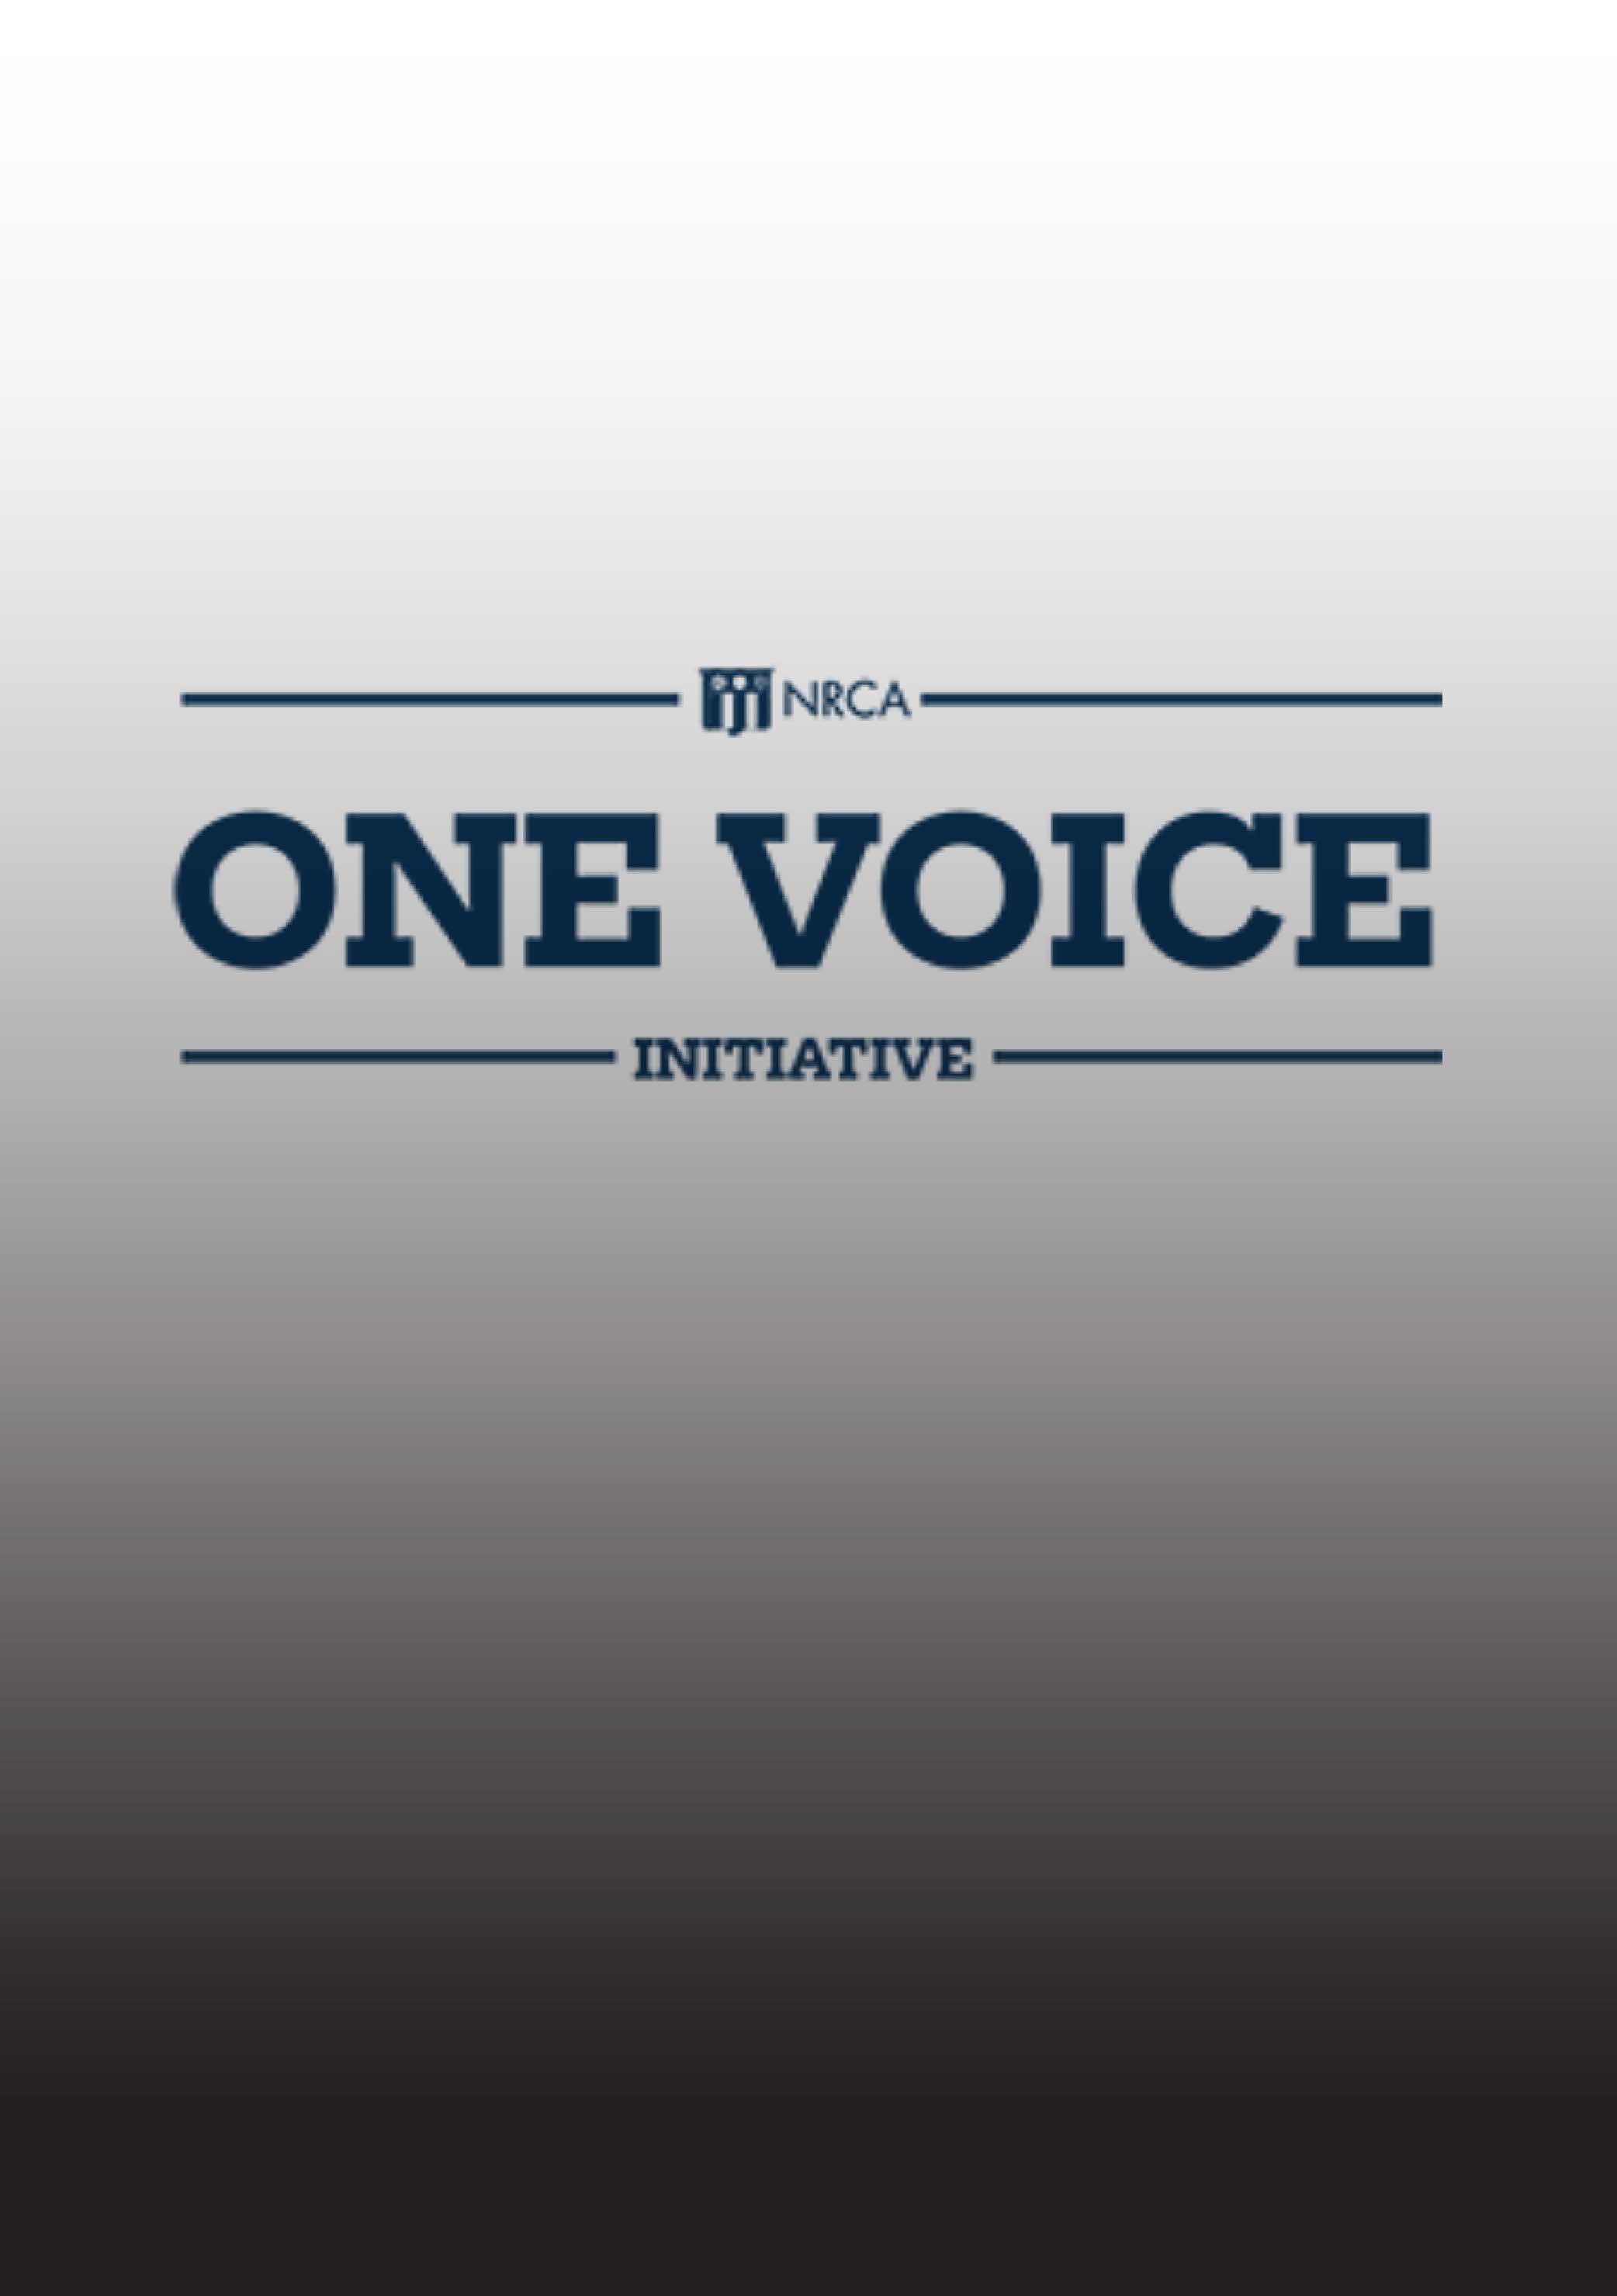 PABCO® & NRCA | One Voice Initiative